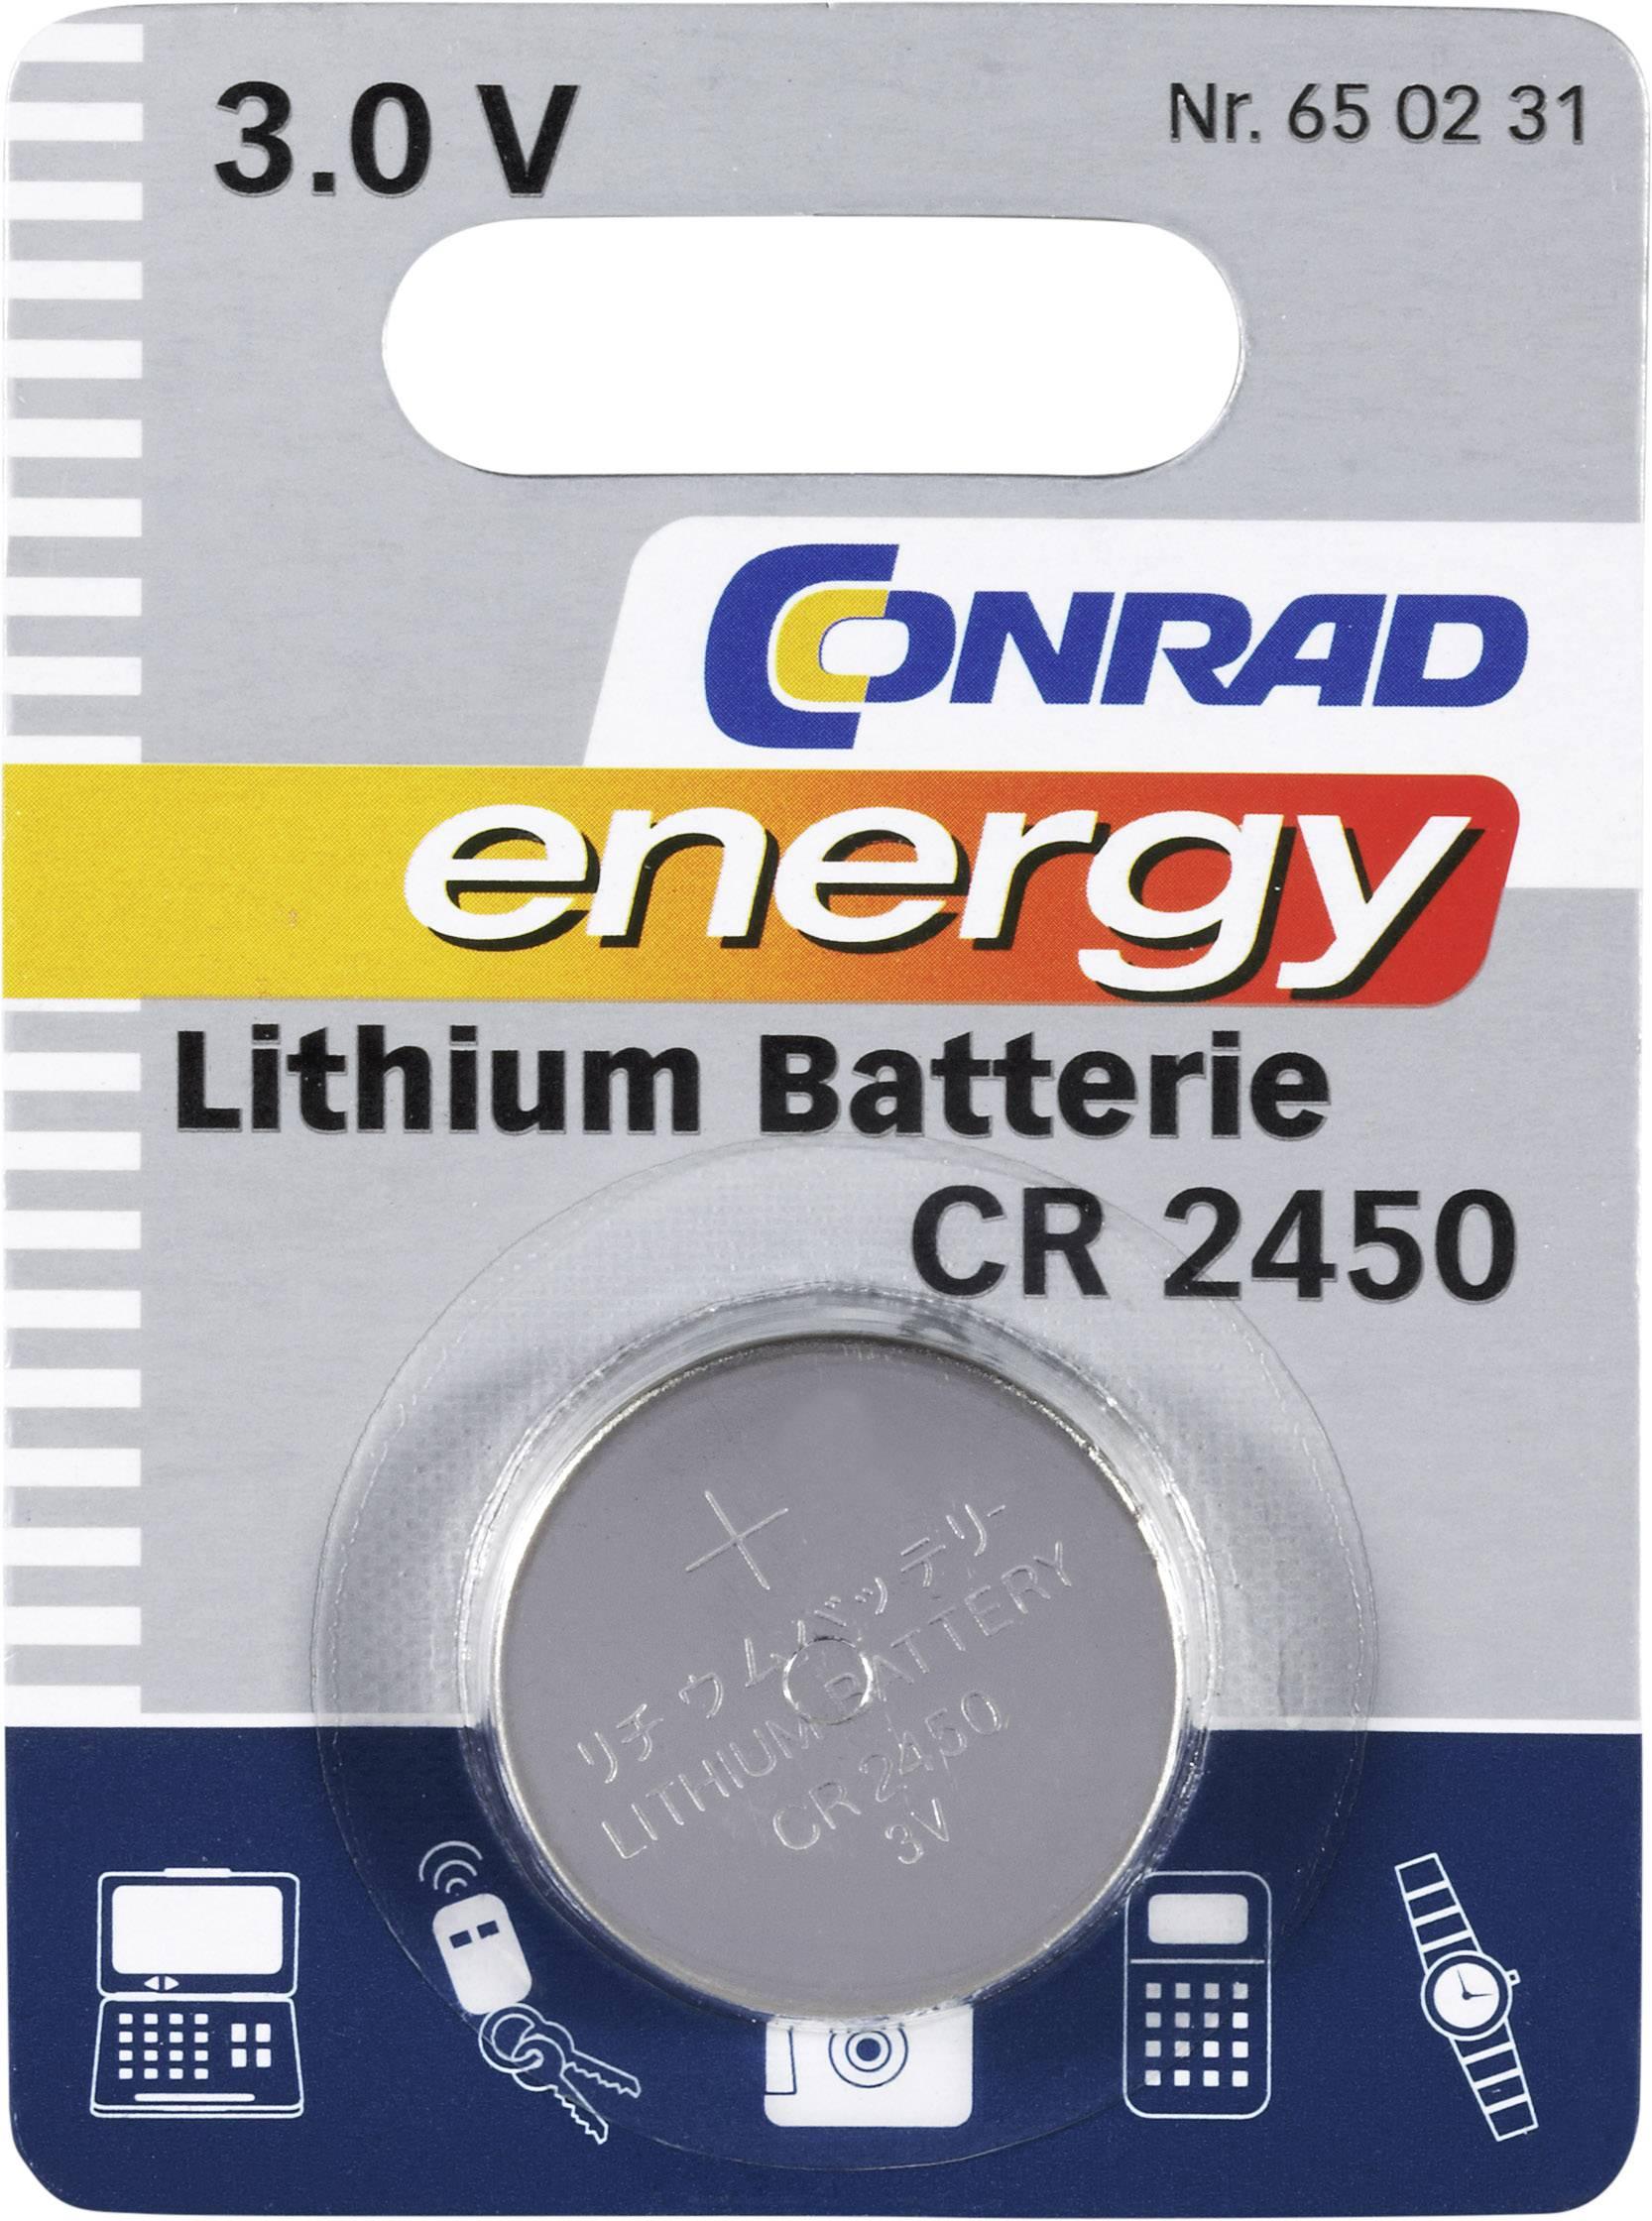 Lítiové gombíkové batérie CR 2450